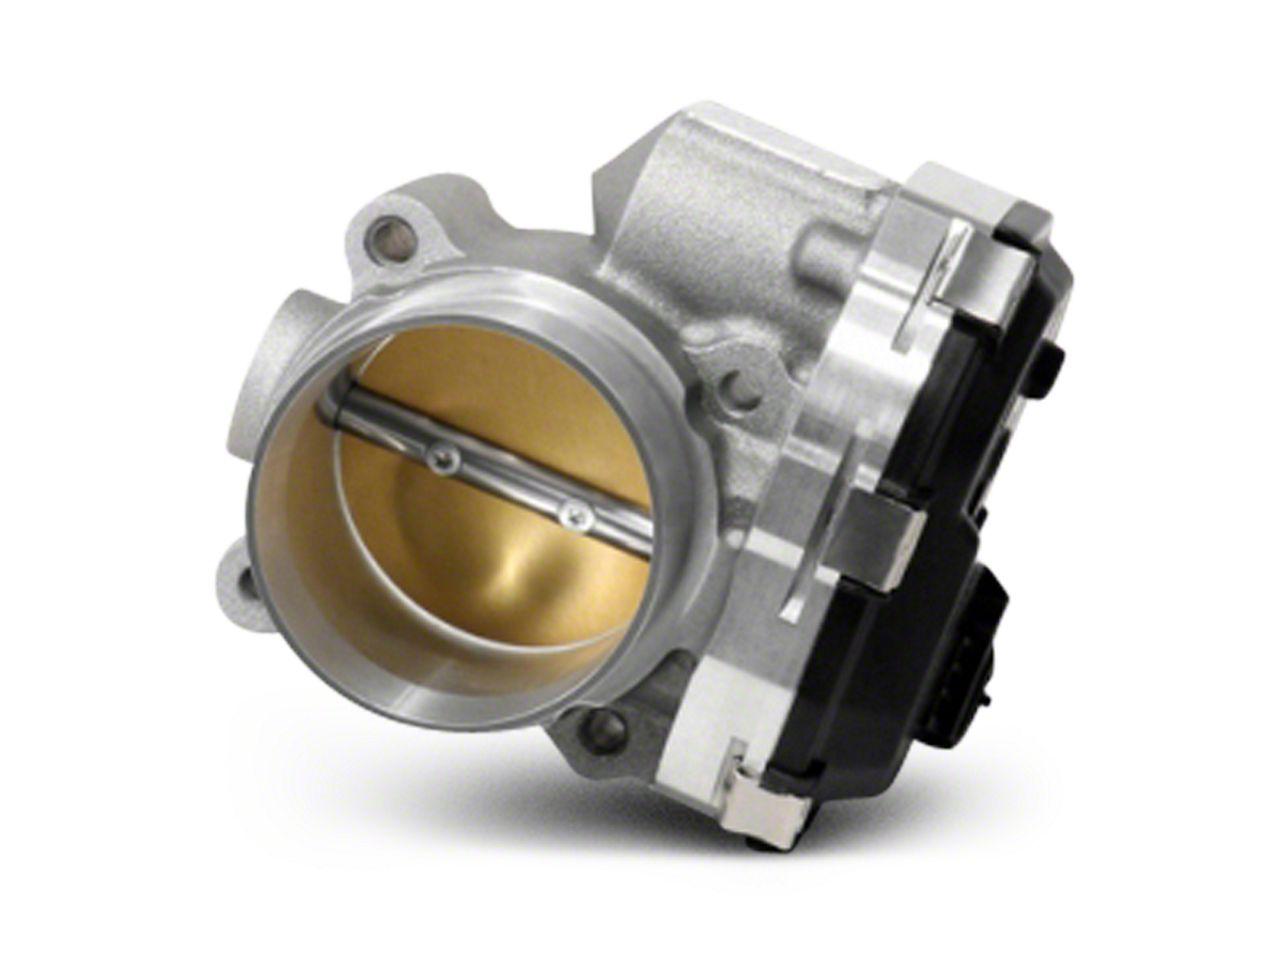 BBK 65mm Throttle Body (15-17 2.7L EcoBoost F-150)